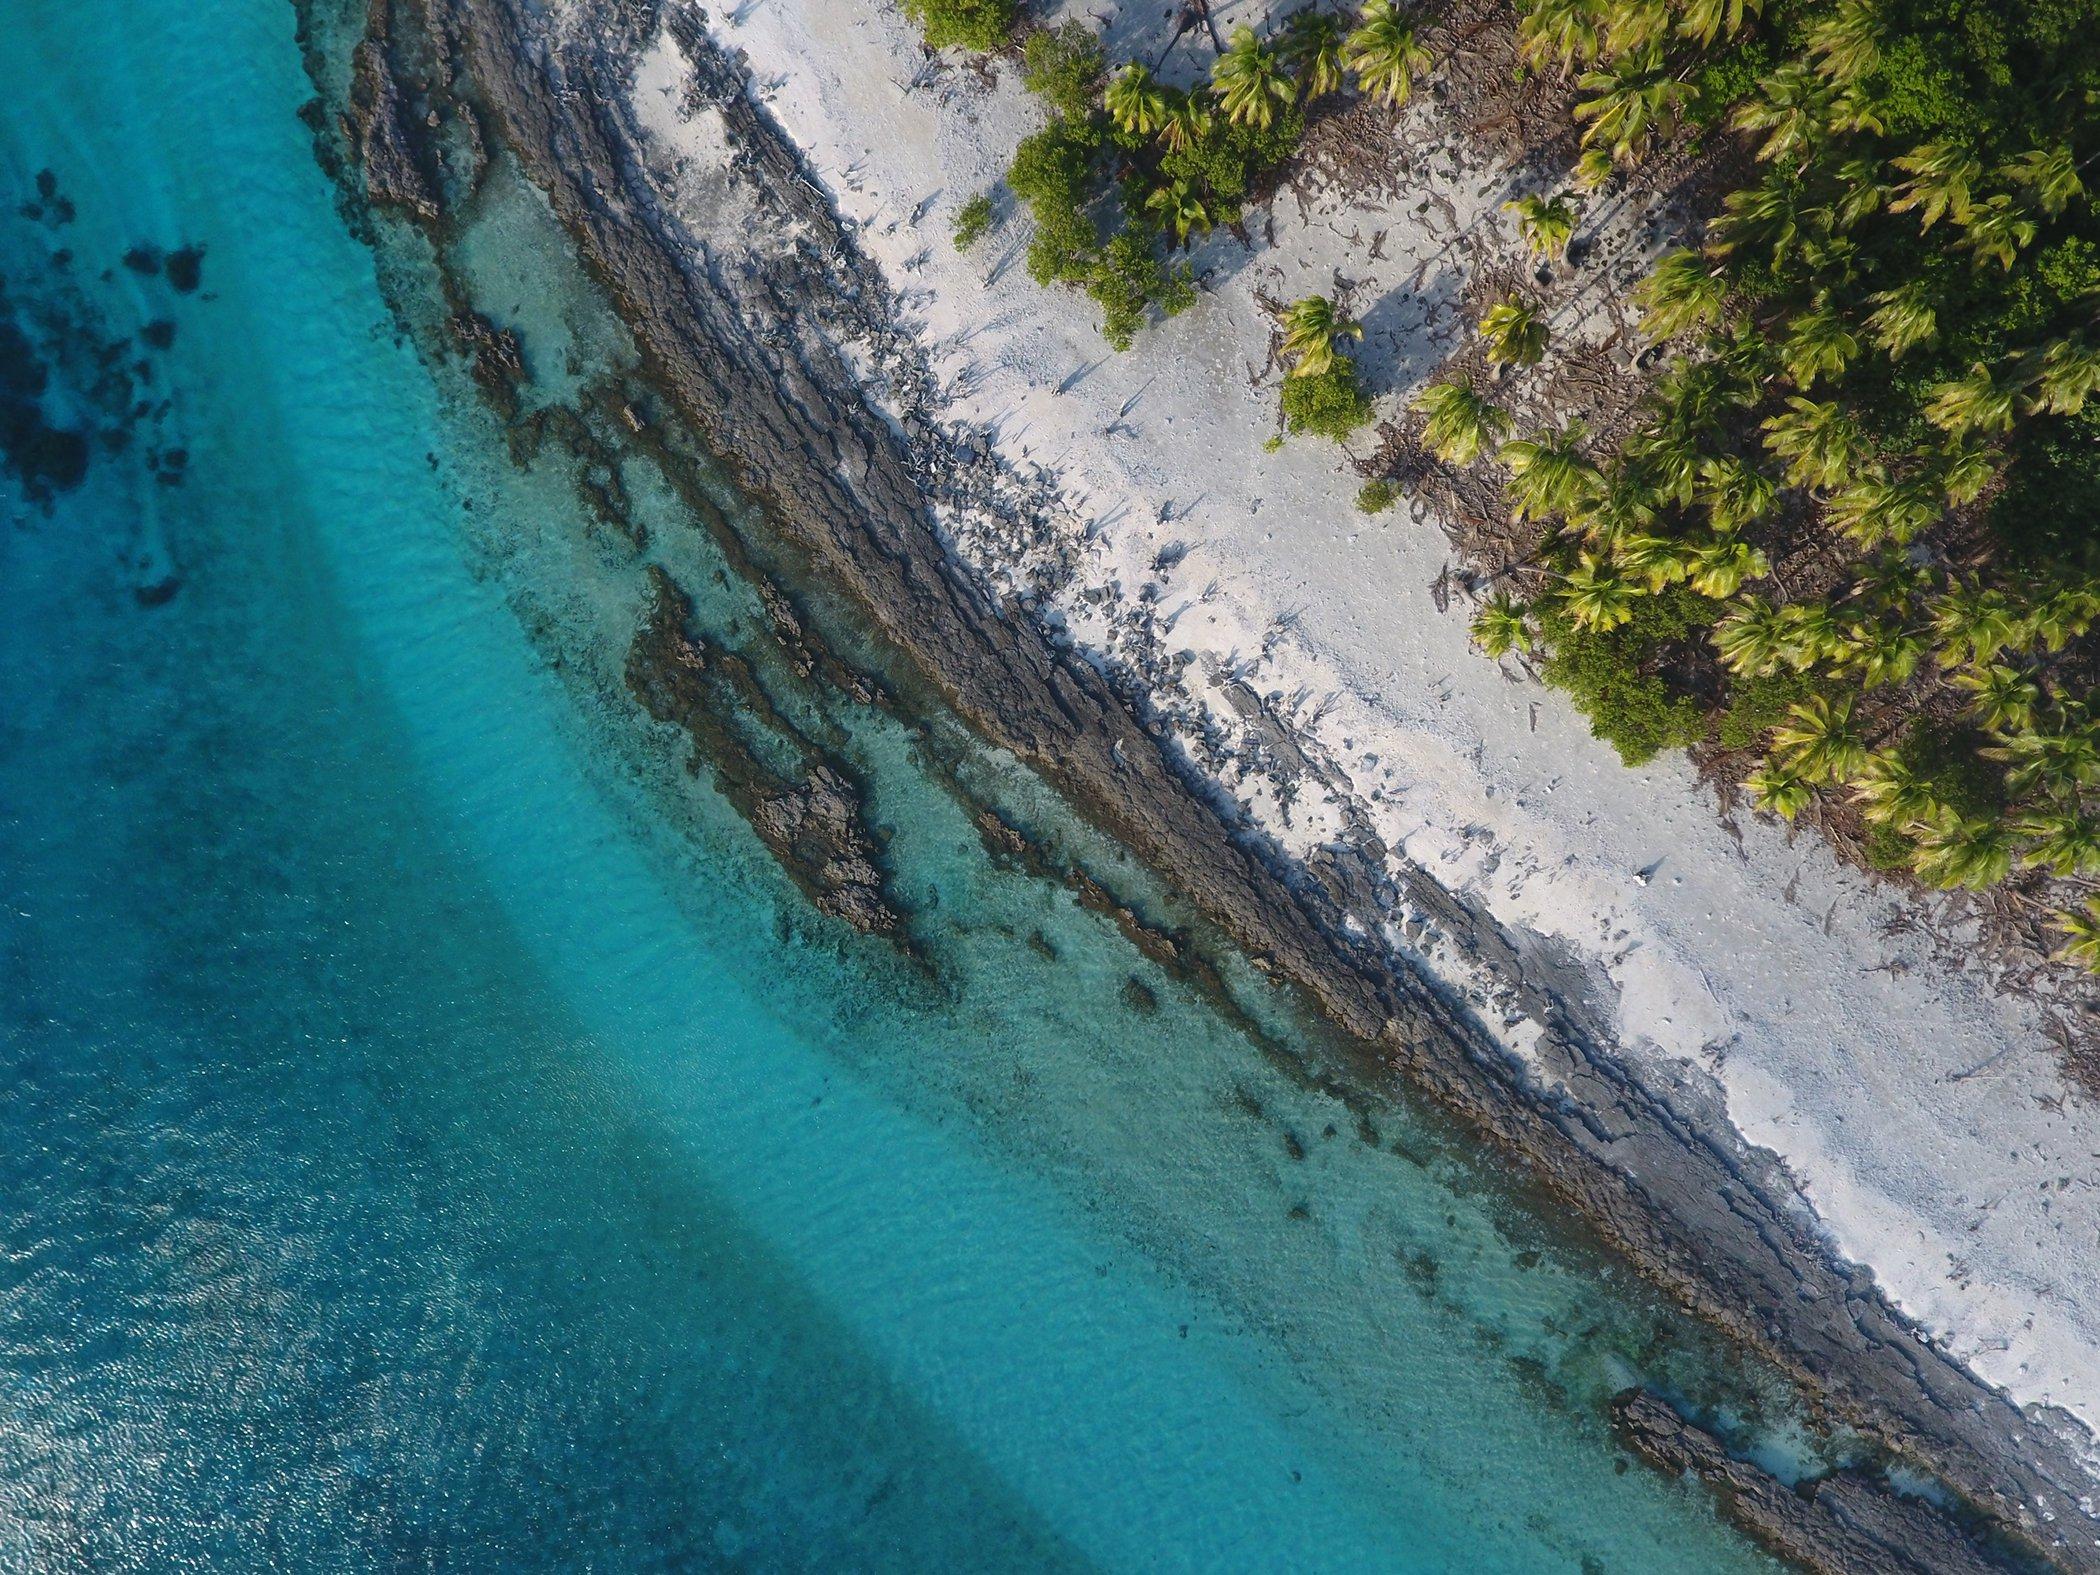 Blue Nature Alliance-Conservation-Oceans-003.jpg